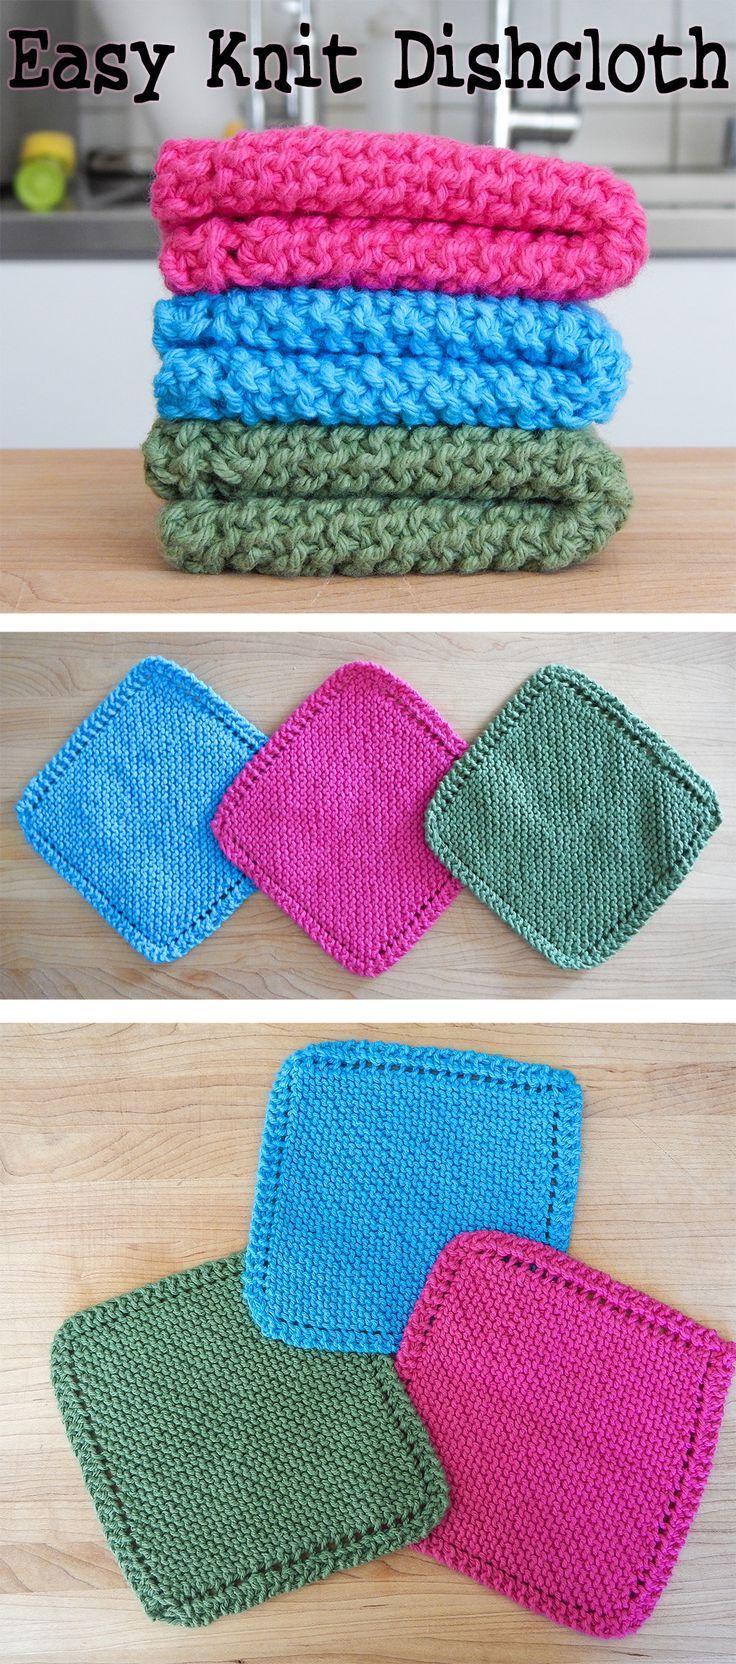 Easy Knit Dishcloth / Washcloth | Knitted dishcloth patterns ...